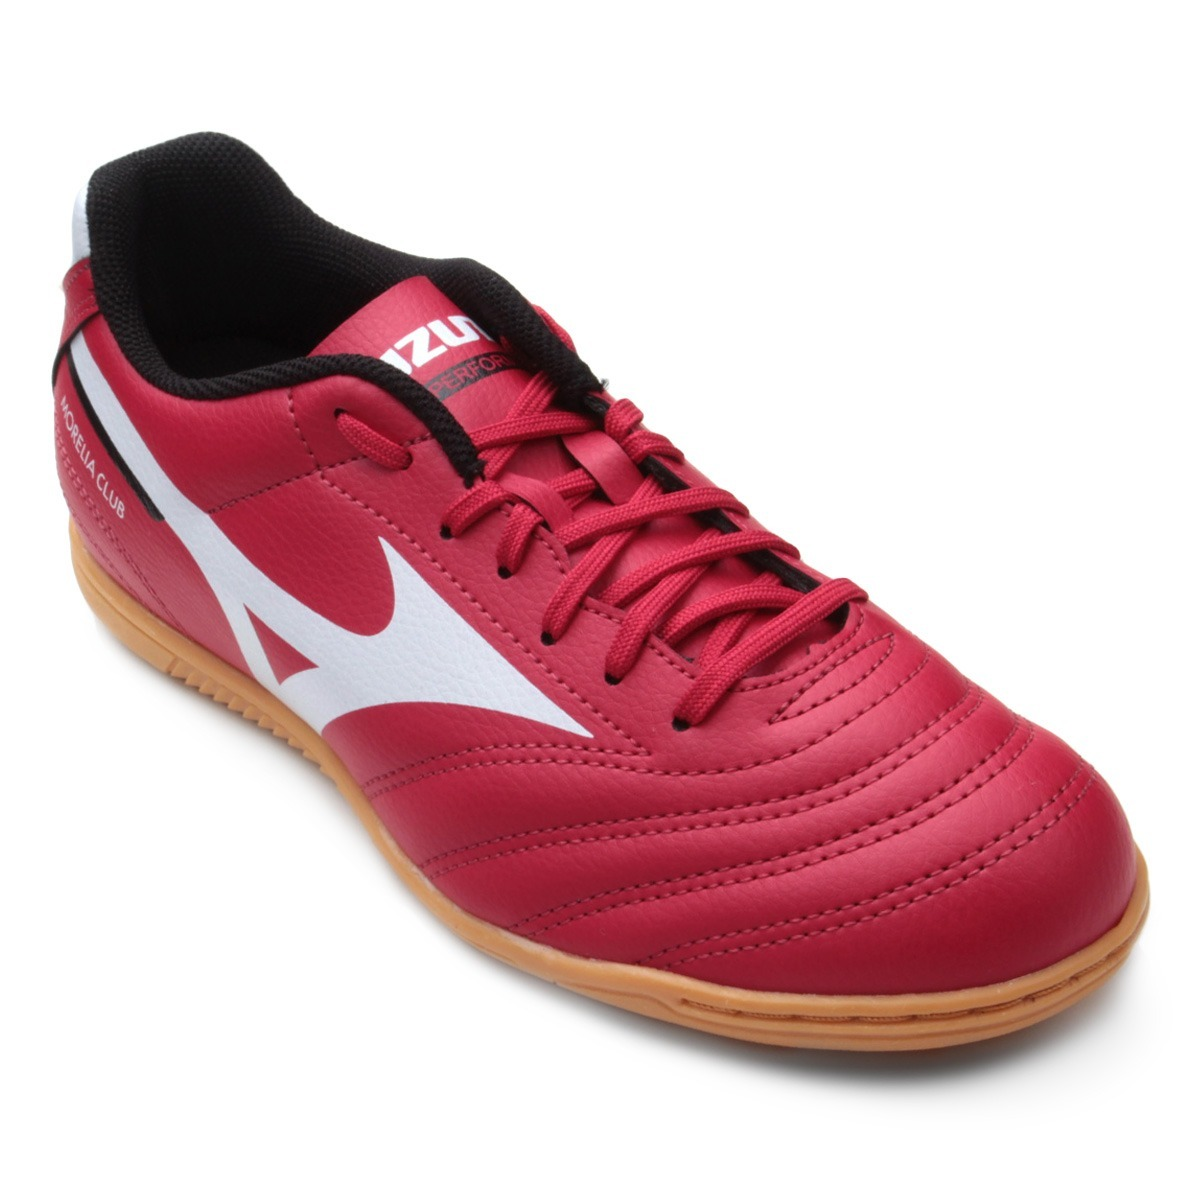 chuteira futsal mizuno morelia club in n masculina -vermelho. Carregando  zoom. 8811effec45a7